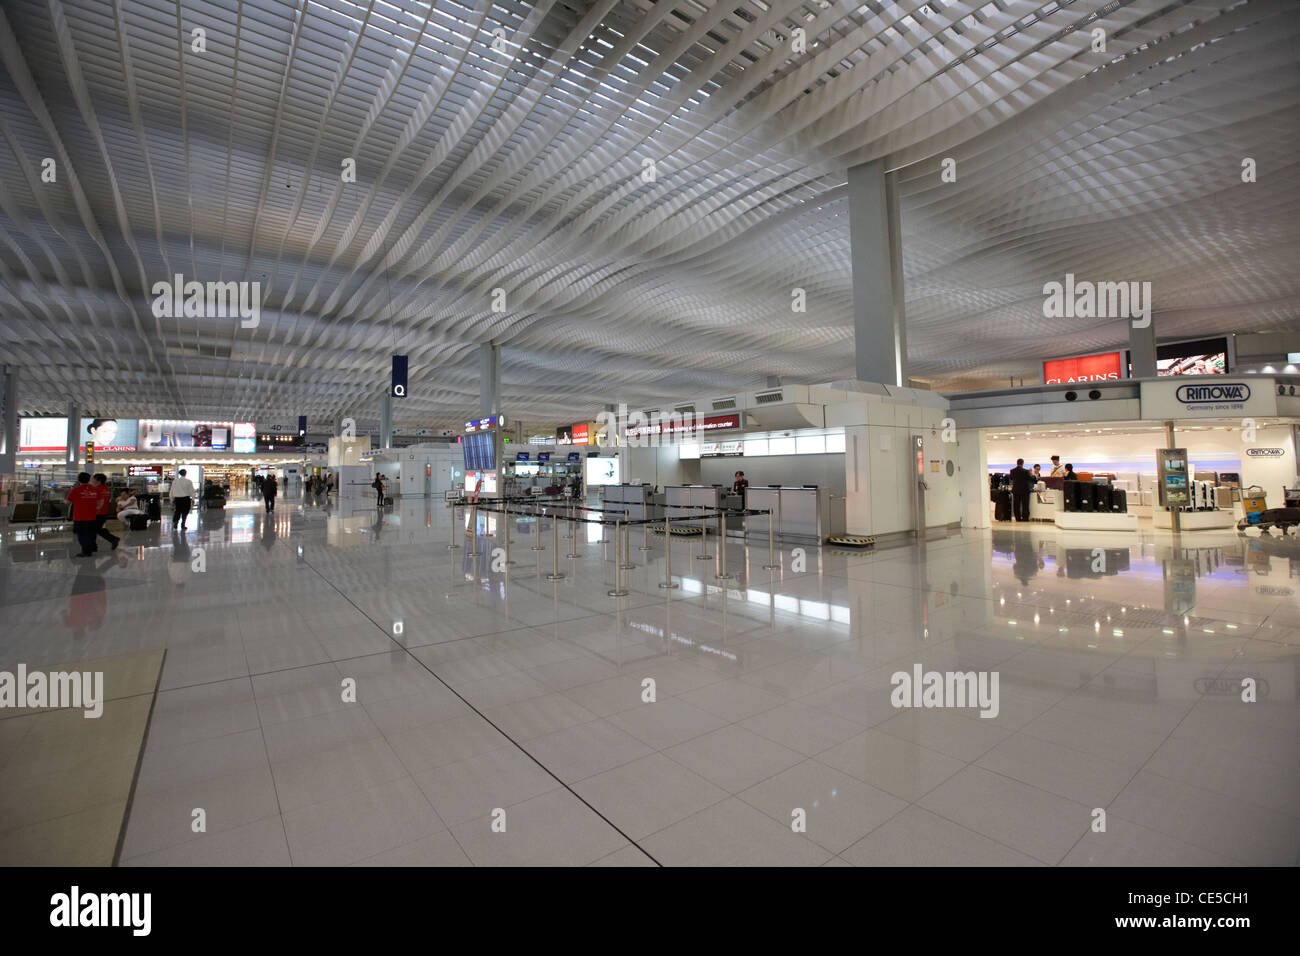 hong kong international airport chek lap kok hksar china asia - Stock Image